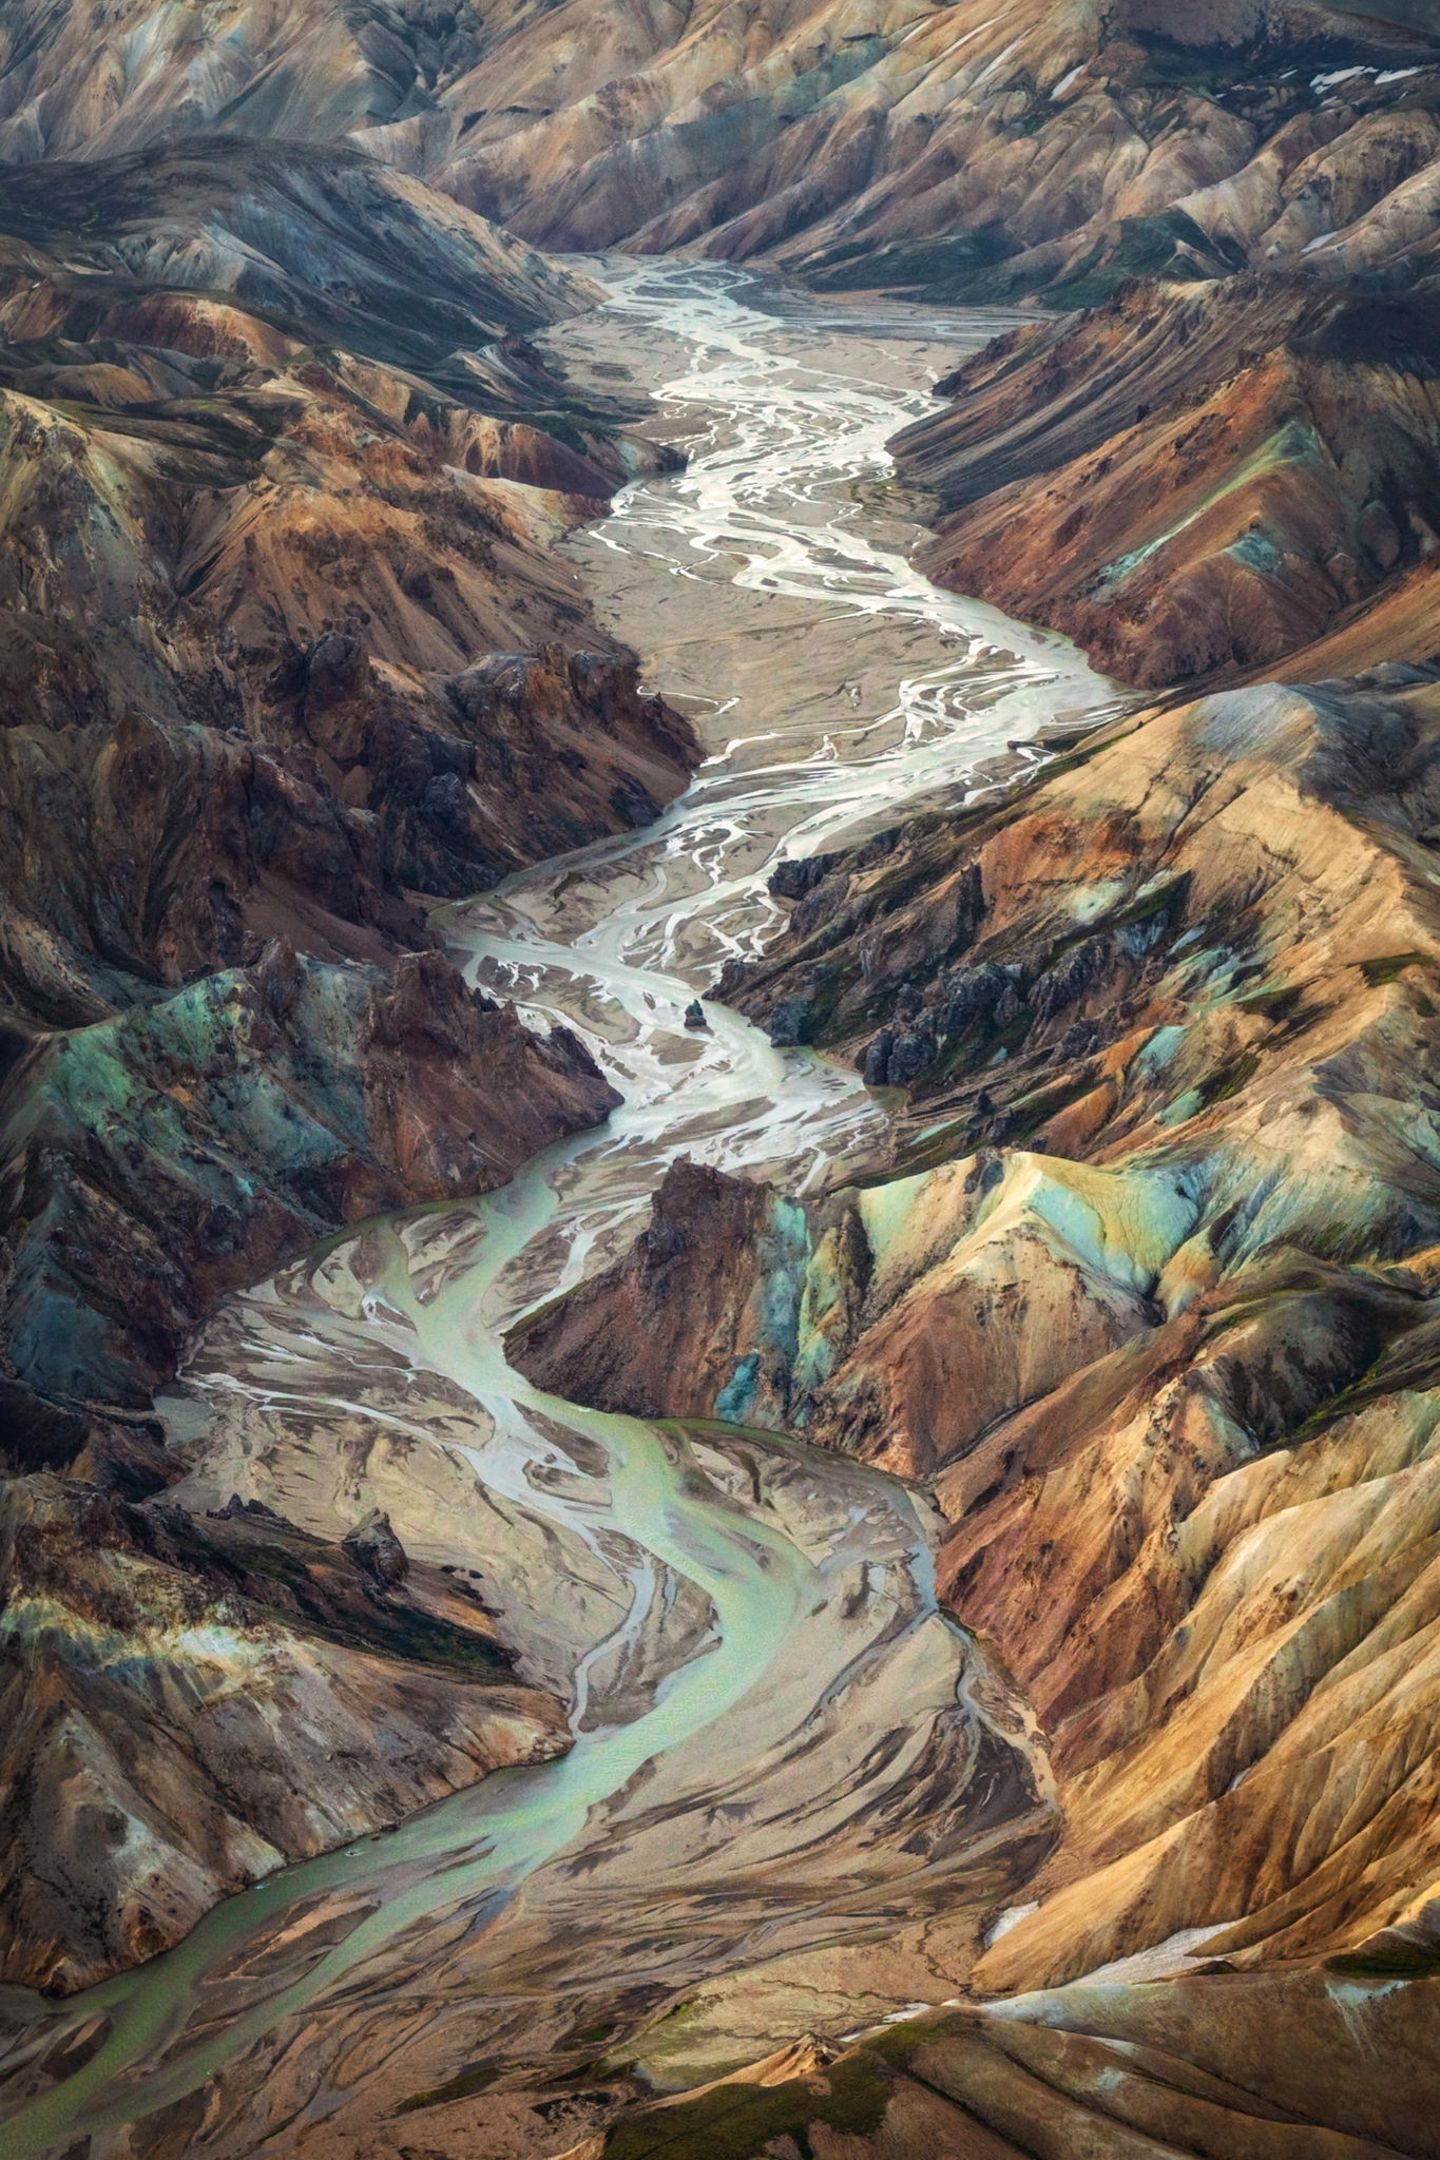 ILPOTY 2020: Berge und Fluss